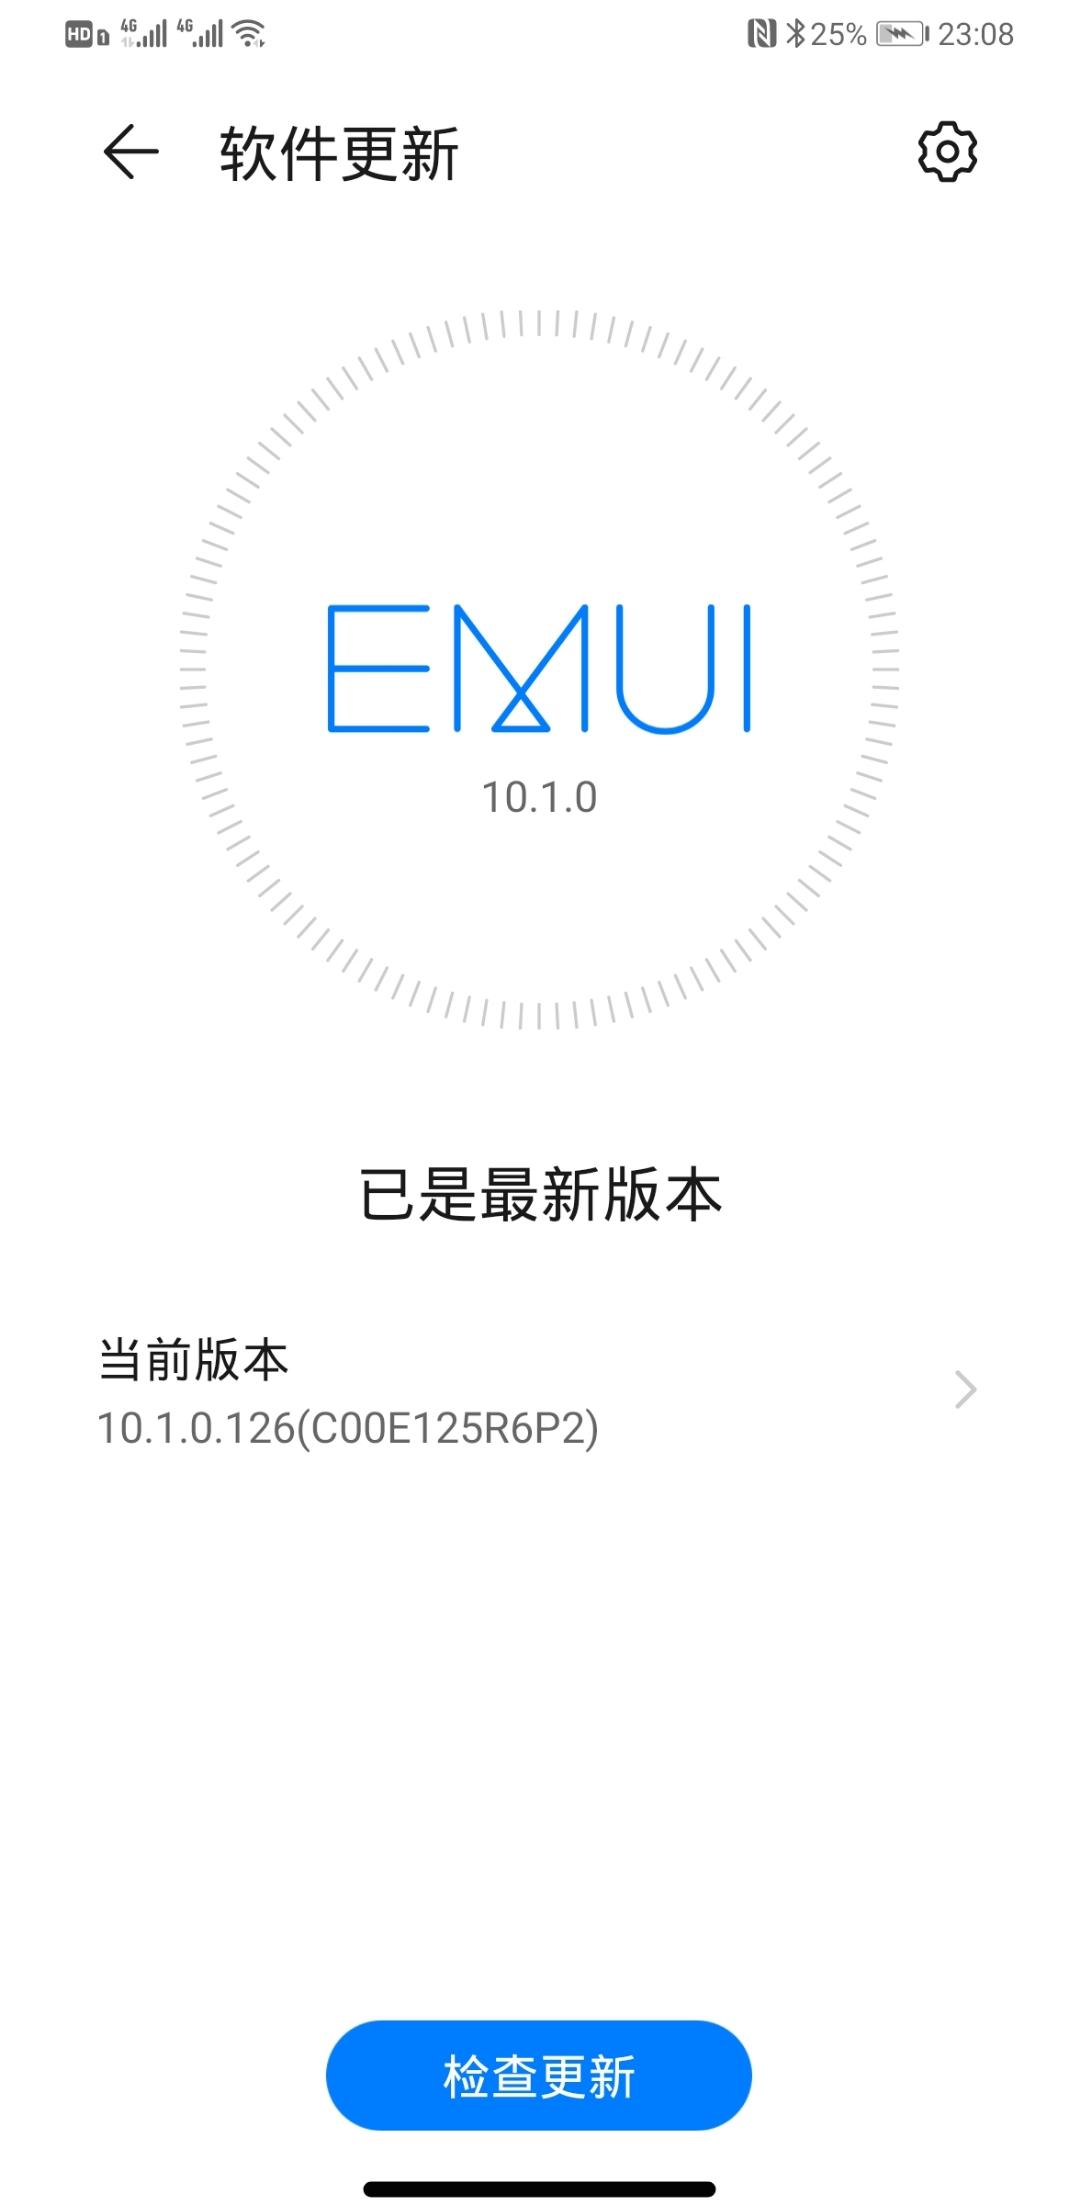 Screenshot_20200515_230856_com.huawei.android.hwouc.jpg